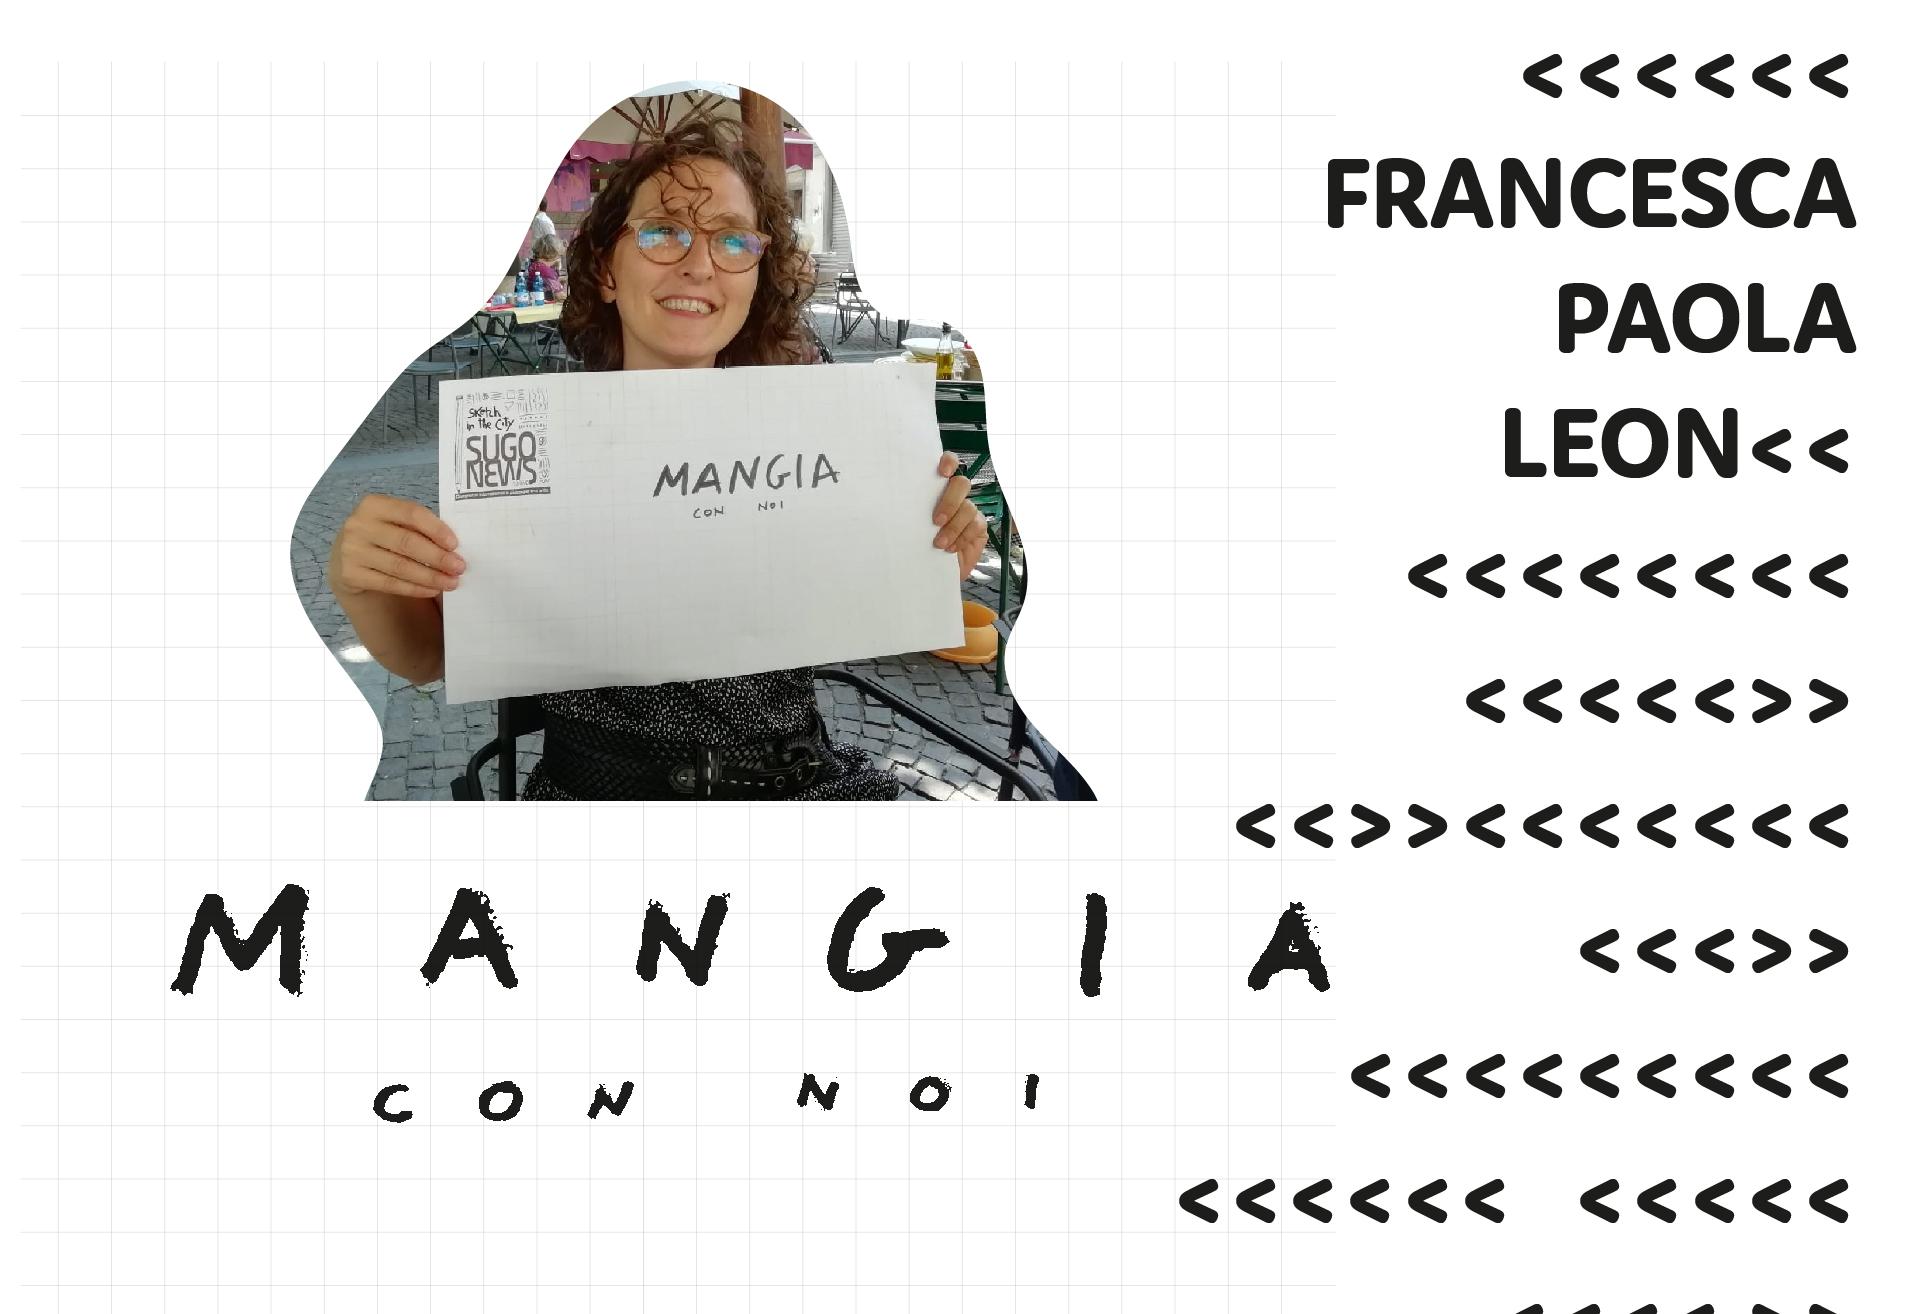 MANGIA CON NOI Francesca Leon